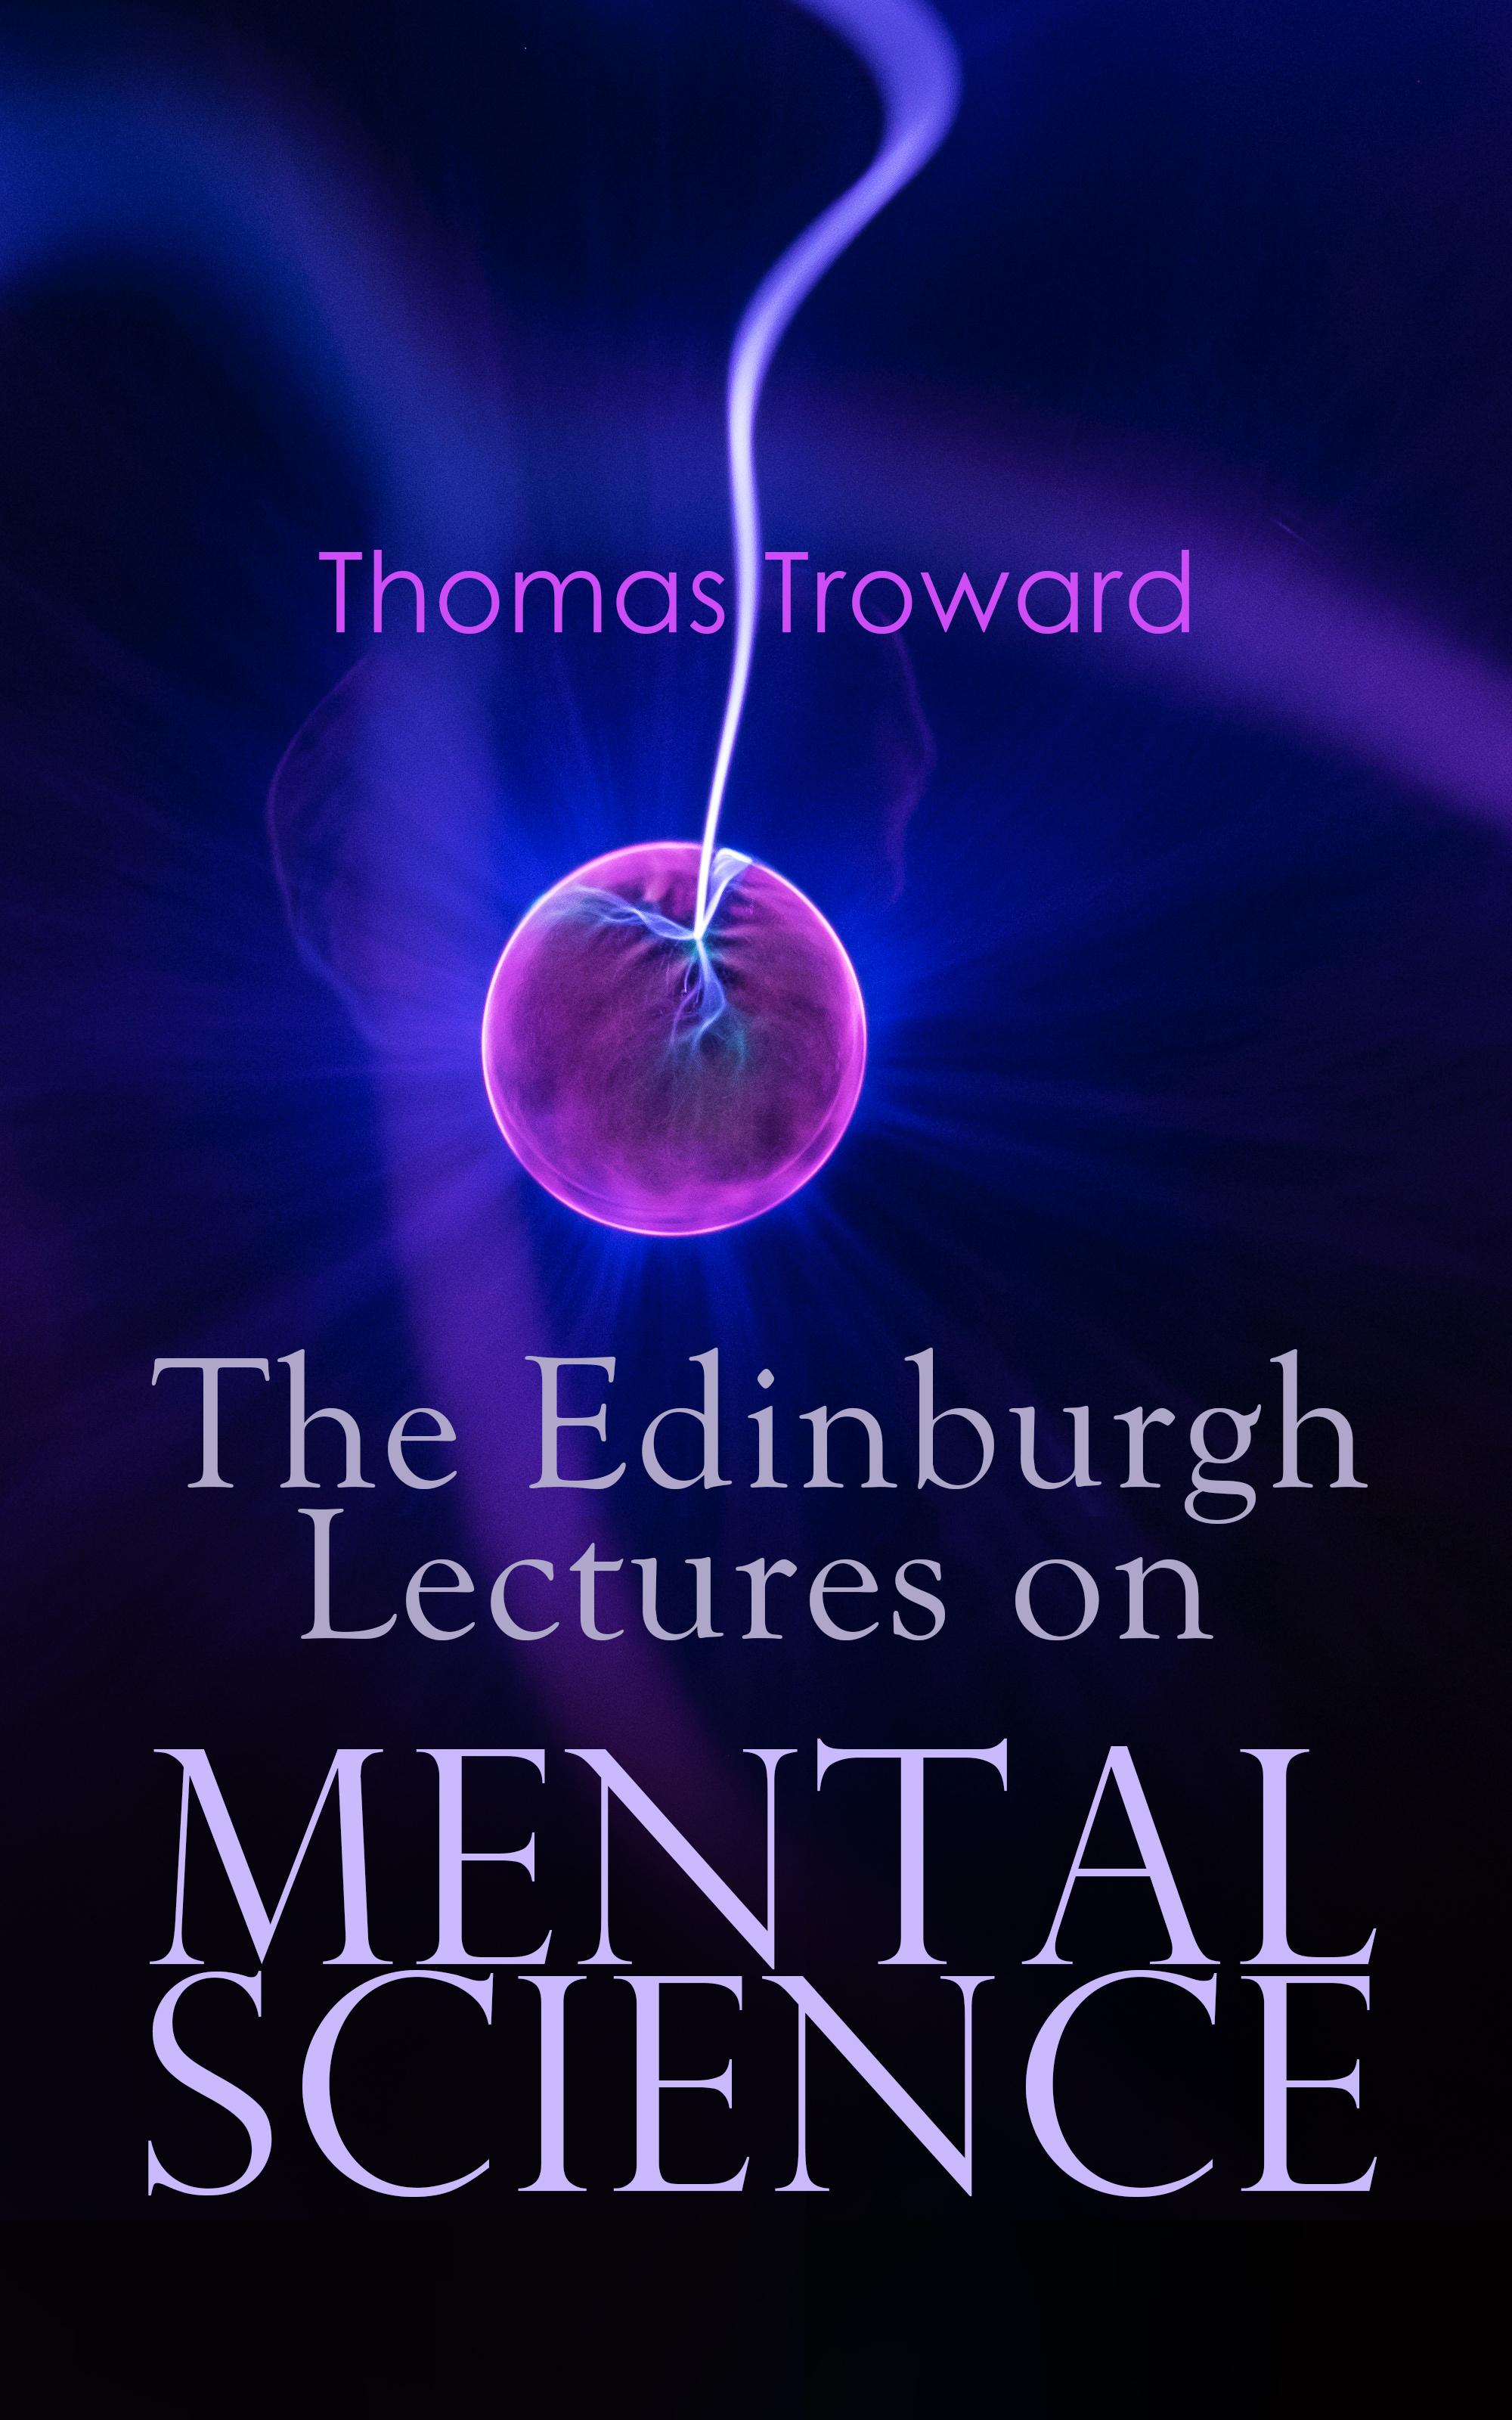 Thomas Troward The Edinburgh Lectures on Mental Science